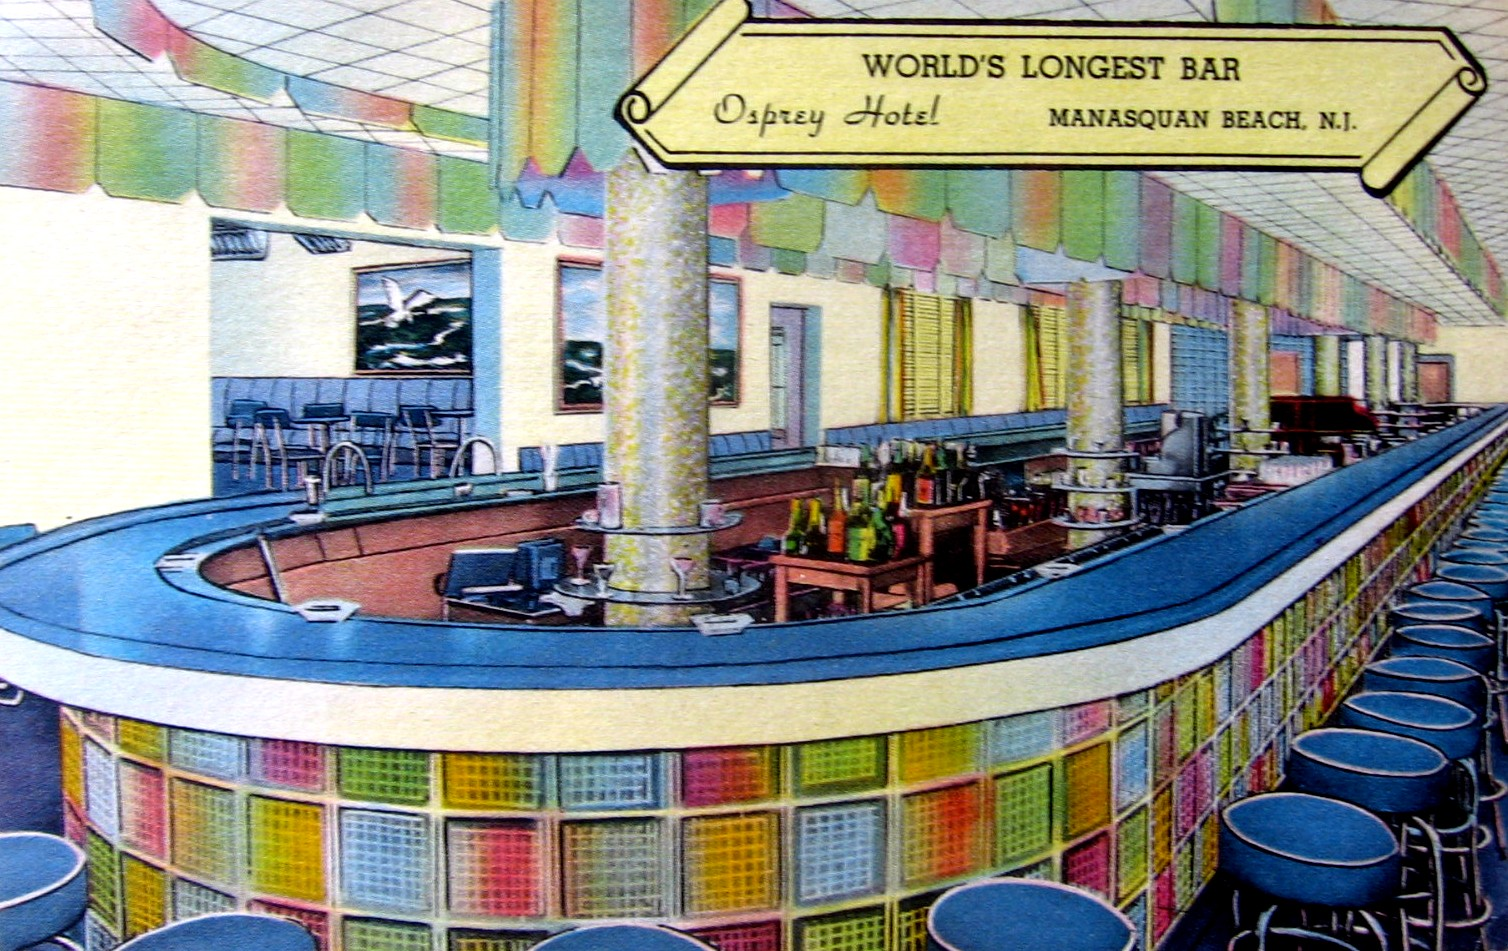 Manasquan Nj World S Longest Bar At The Osprey Hotel